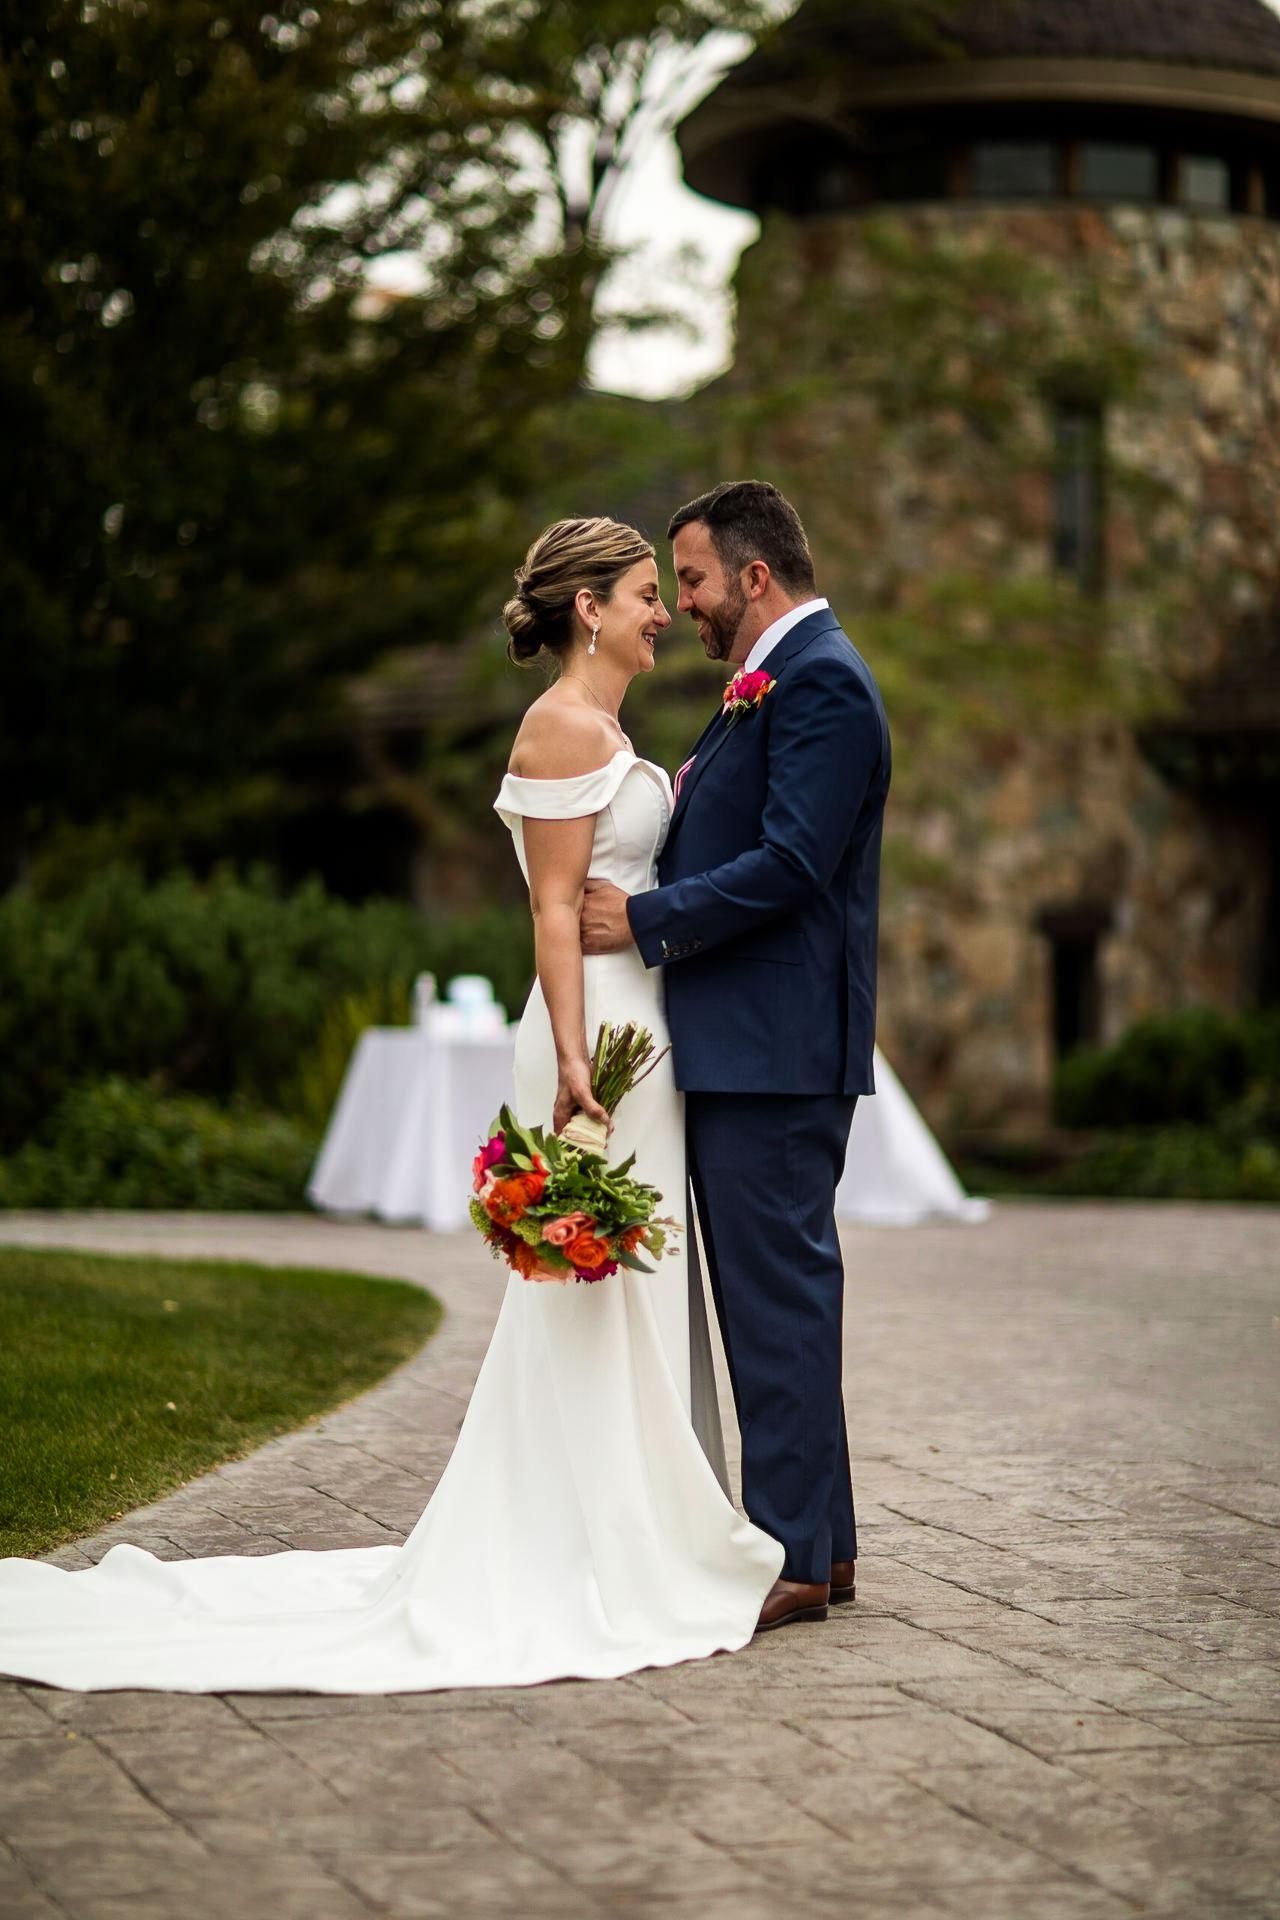 Downtown-Salt-Lake-City-Wedding-1236